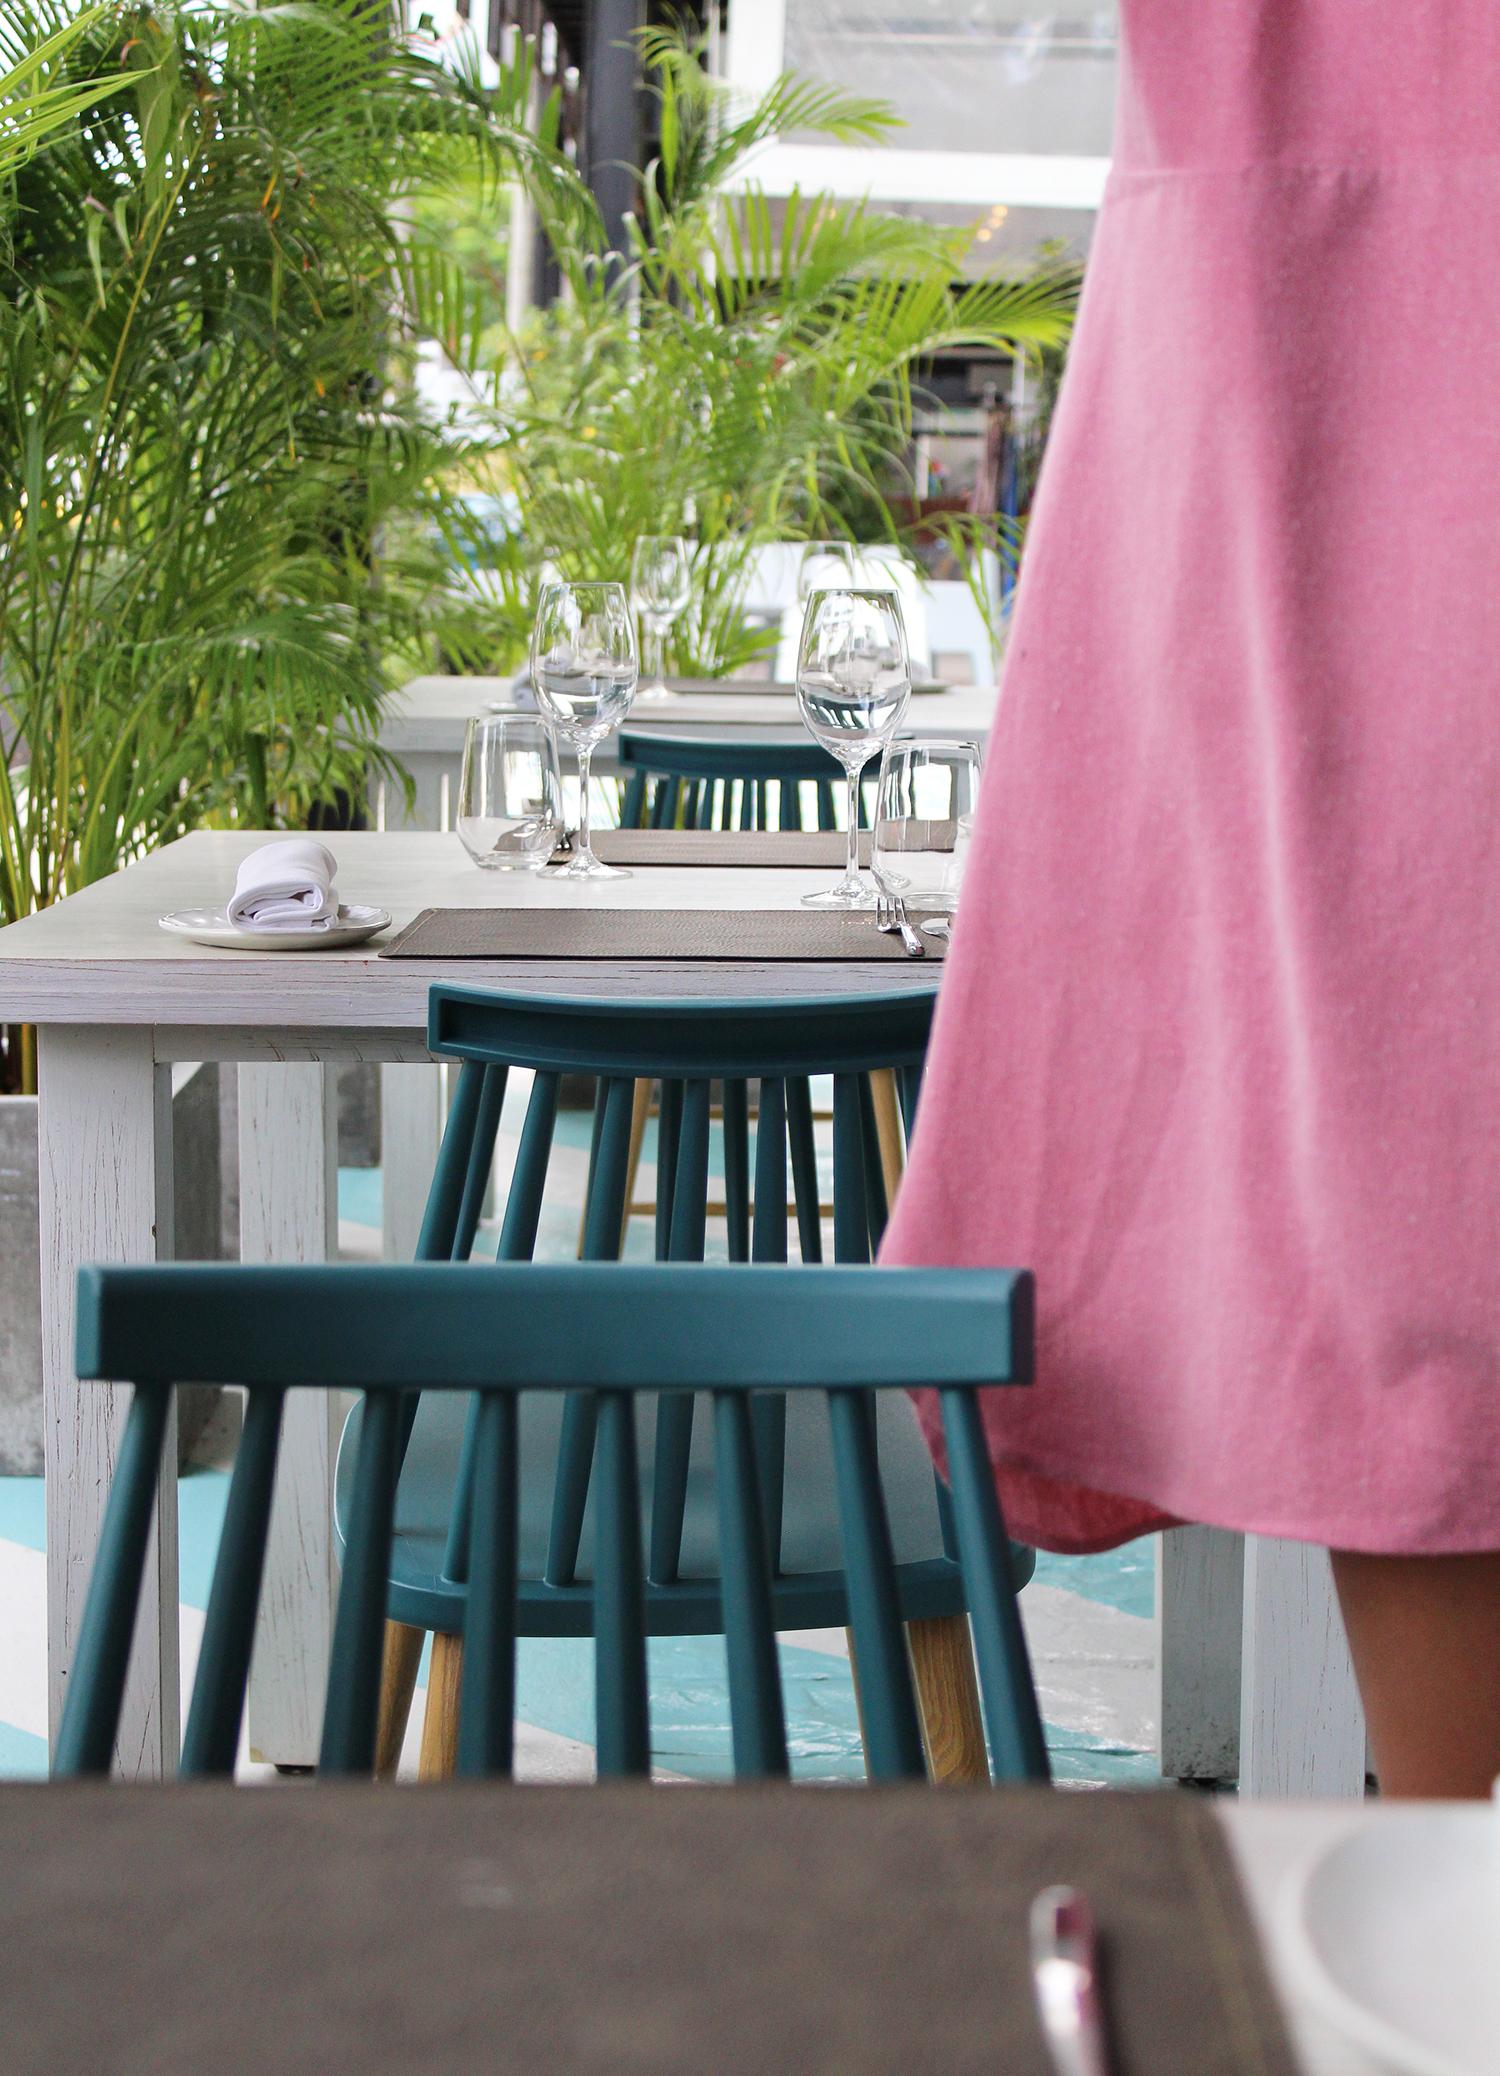 wearemad phuket boat avenue.jpg